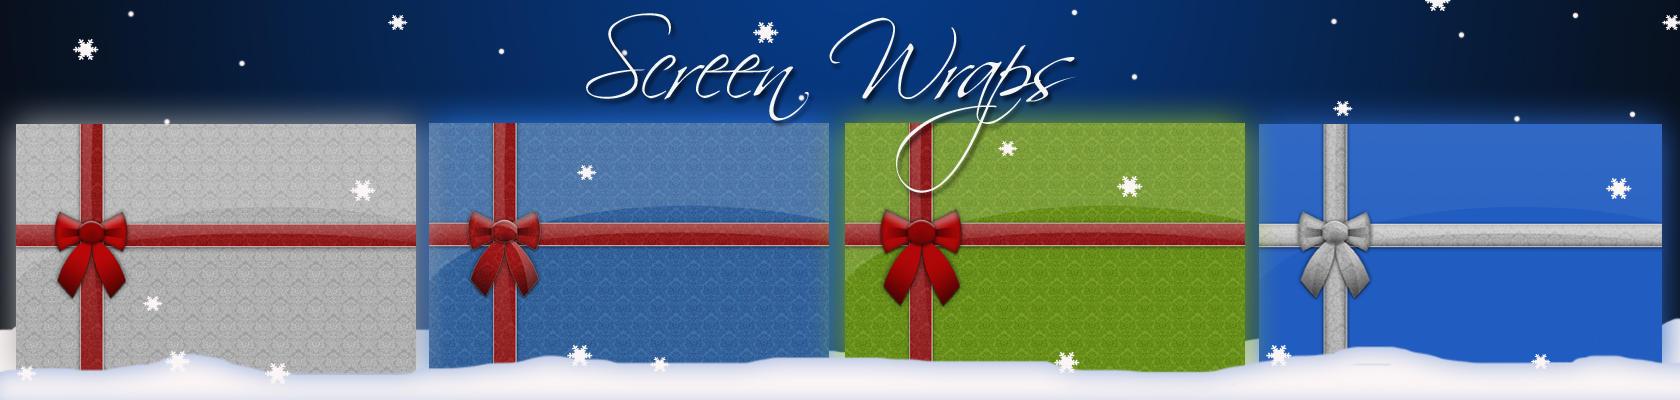 Screen Wraps